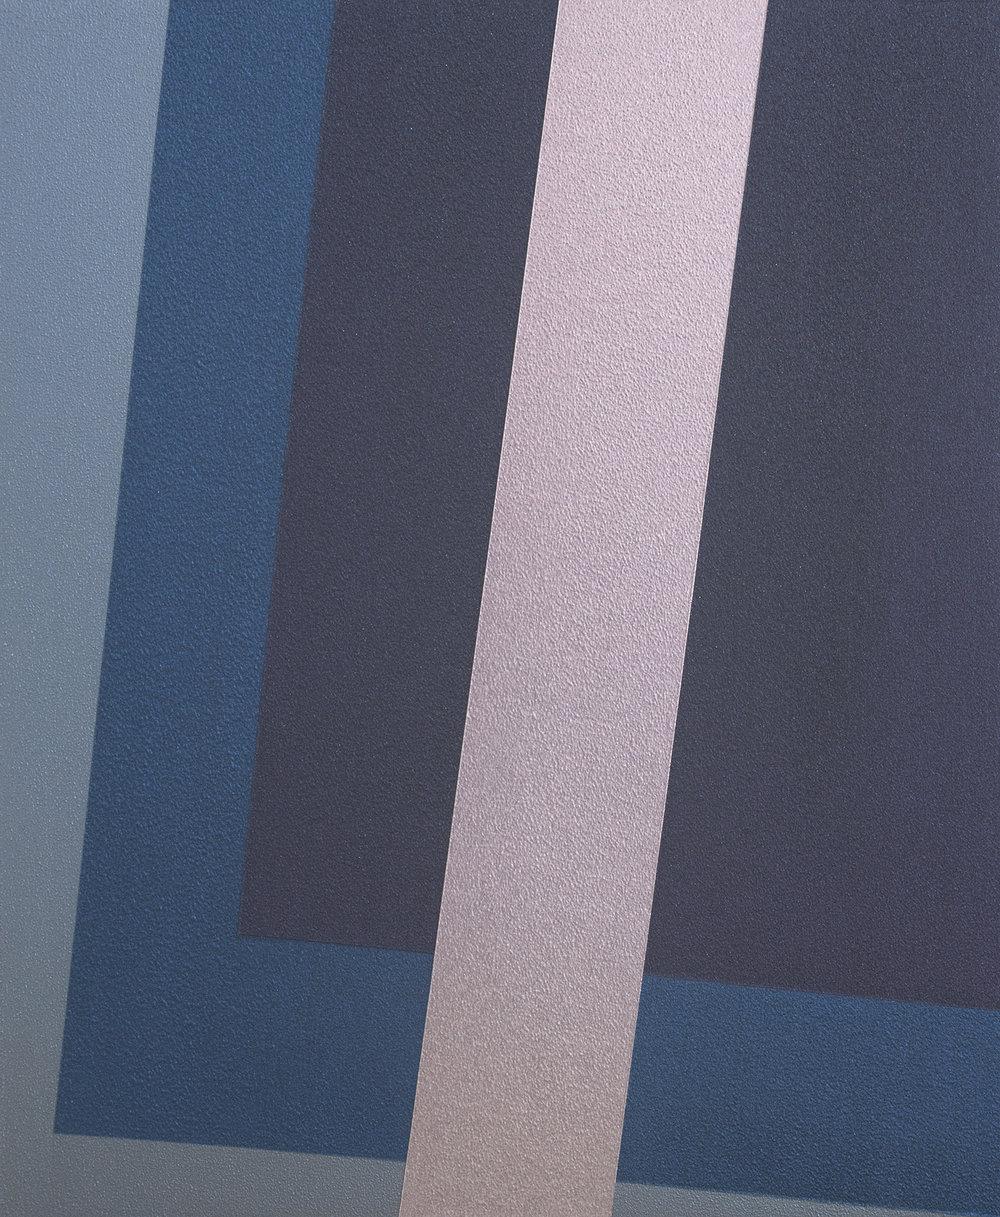 SAMARA ADAMSON-PINCZEWSKI  Violet Corner 2  2014 acrylic on wood panel 30 ×25 cm